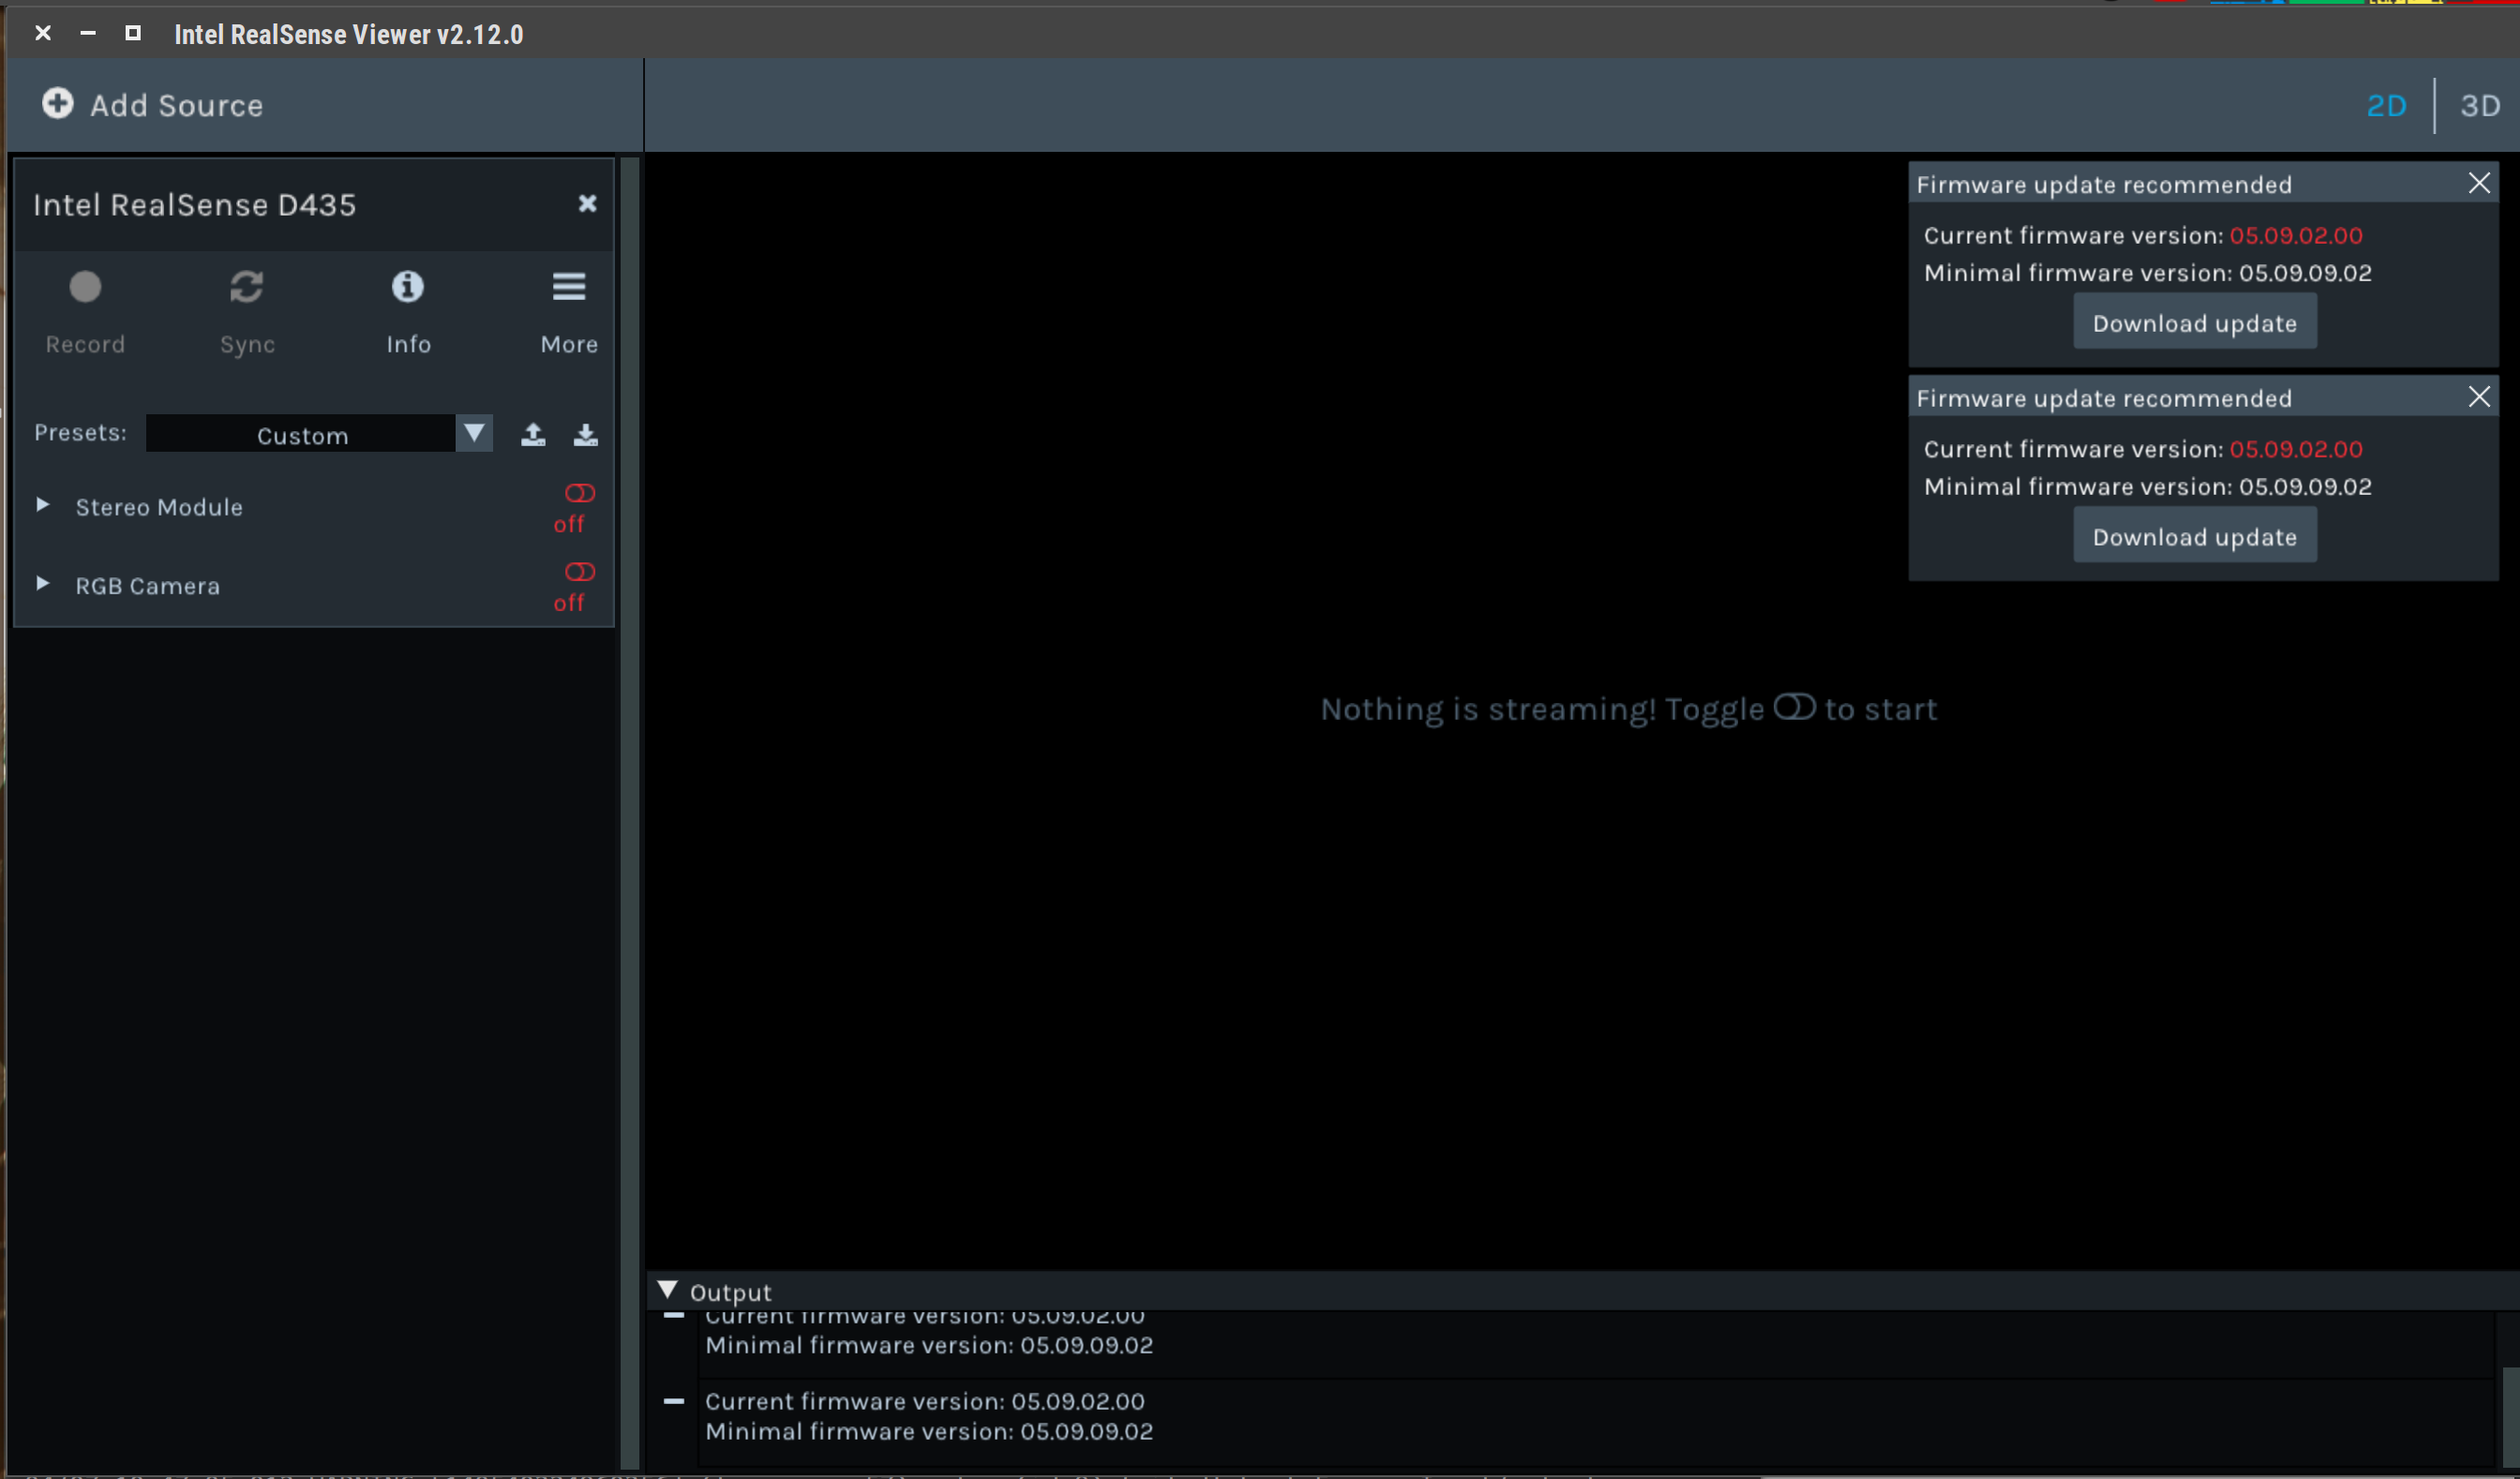 realsense-viewer-update.png